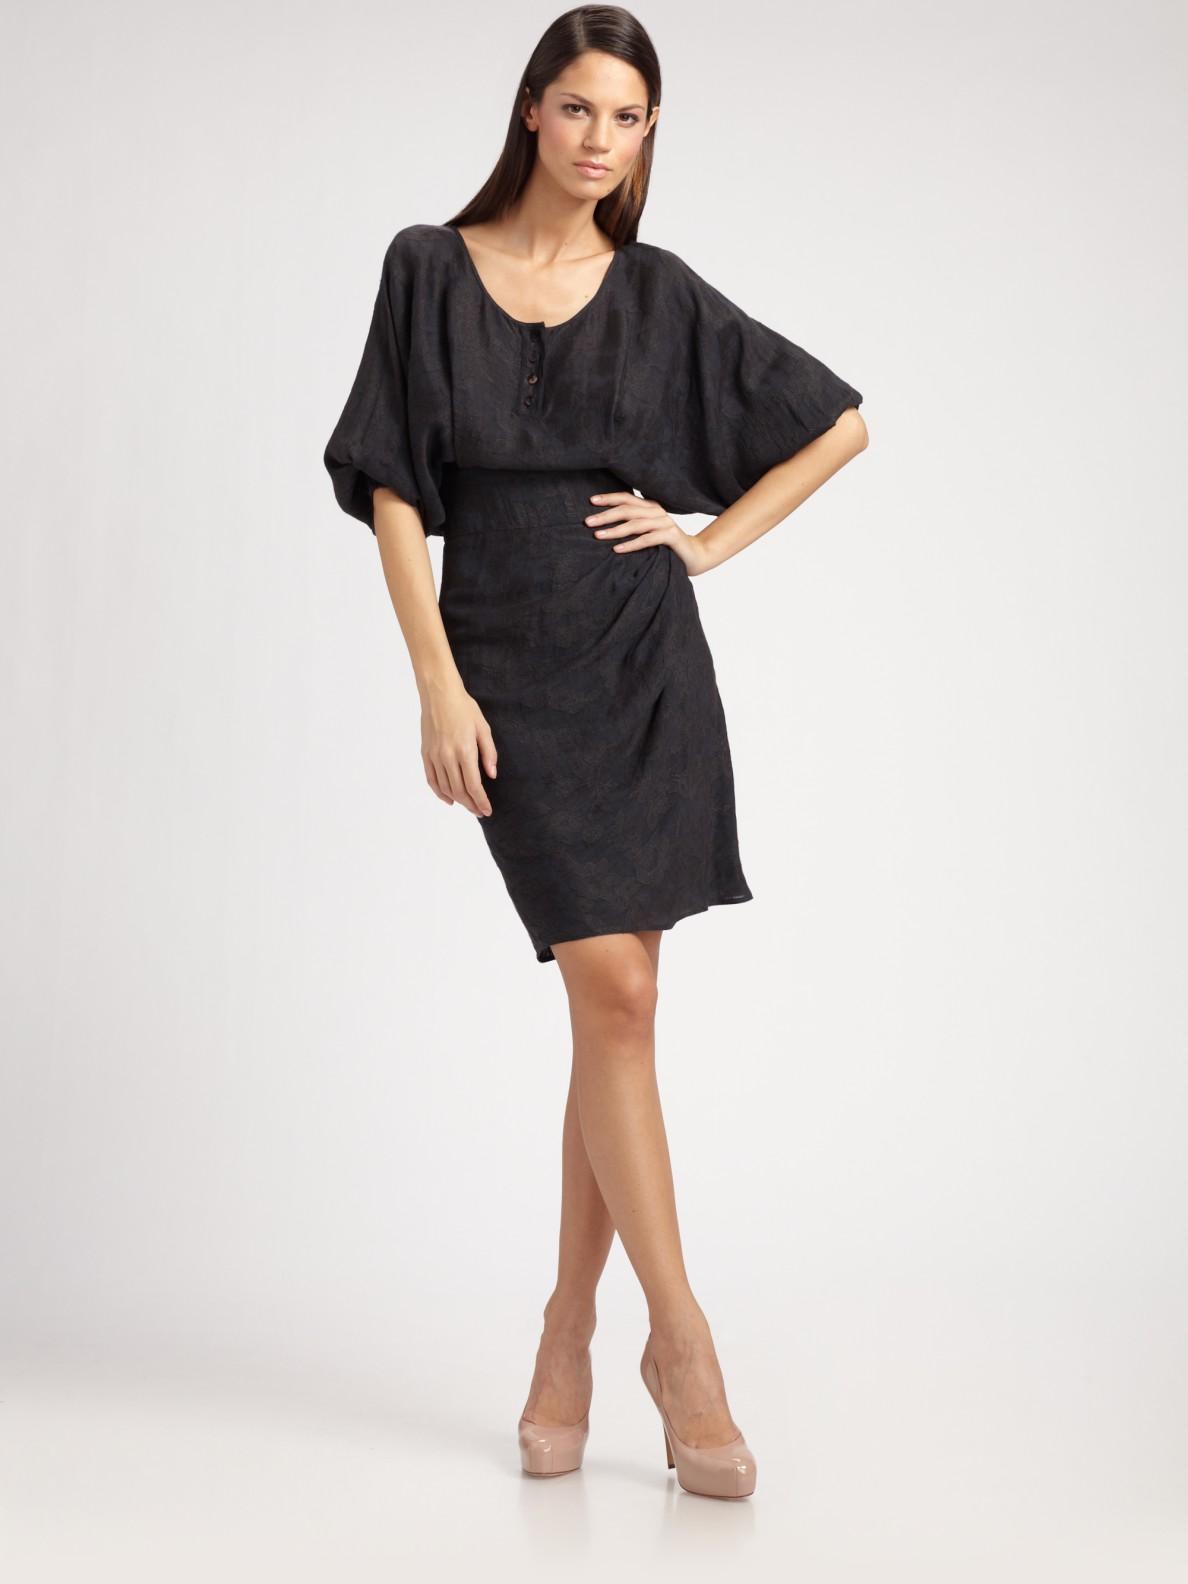 Lyst Sophie Theallet Damask Bat Sleeve Dress In Gray